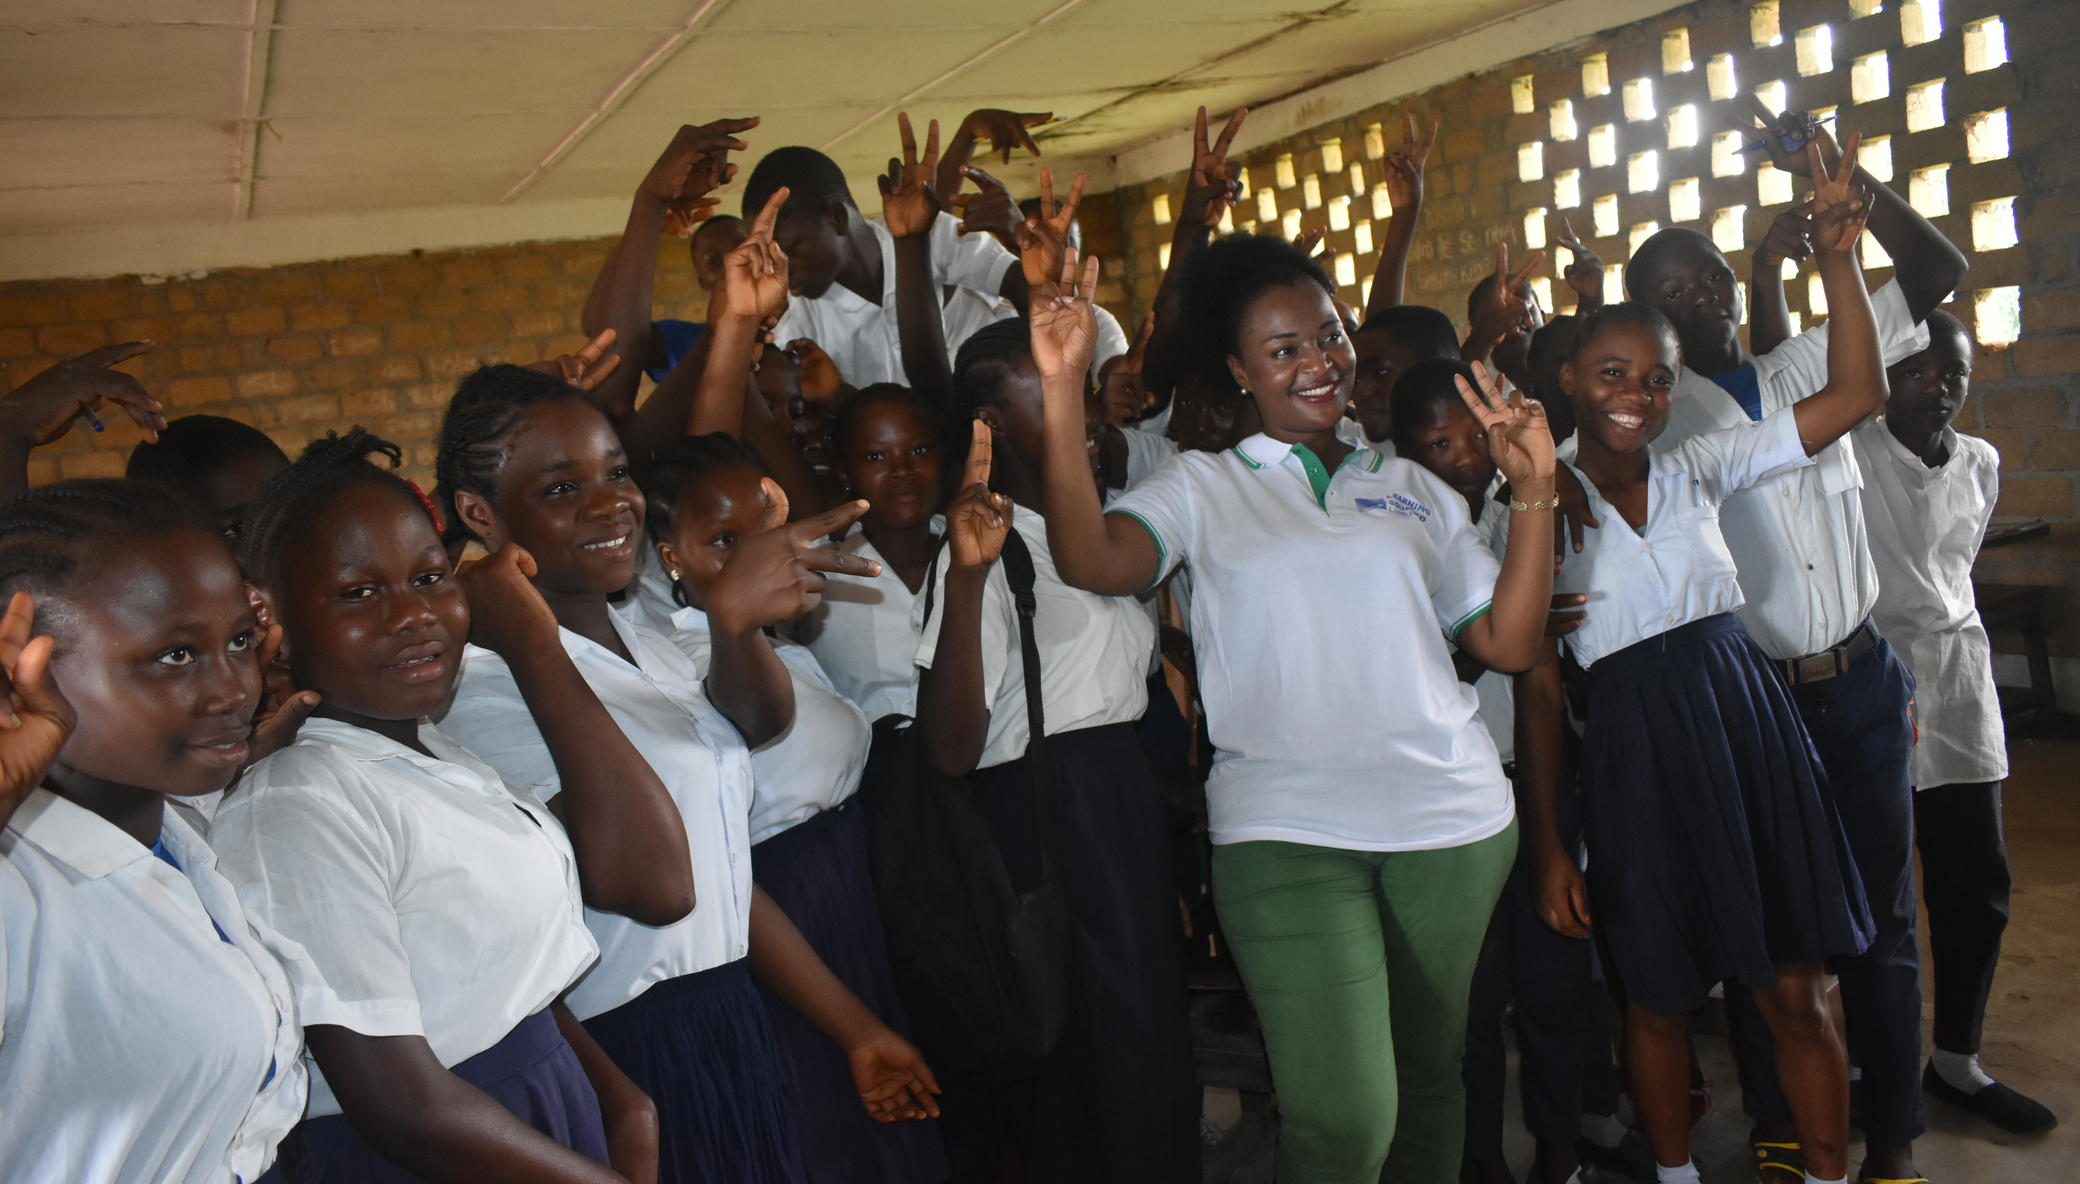 Support Children Education in Rural Liberia